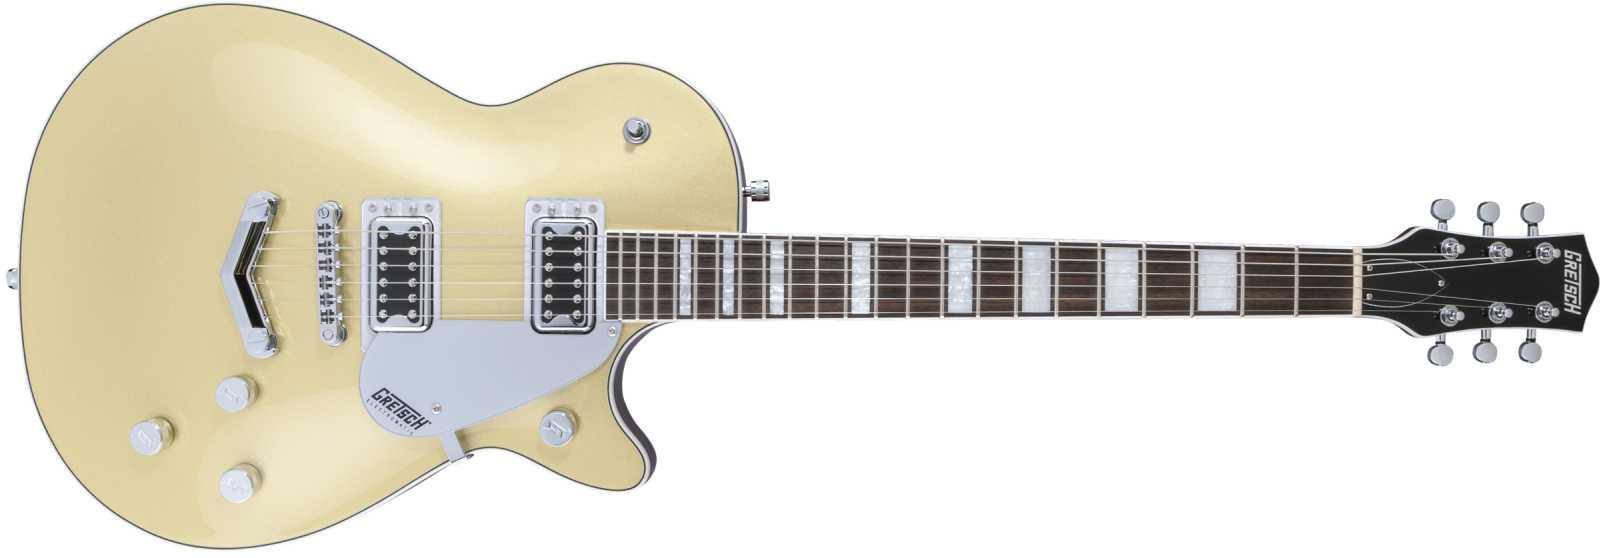 Gretsch Guitar G5220 Electromati Jet BT CGD